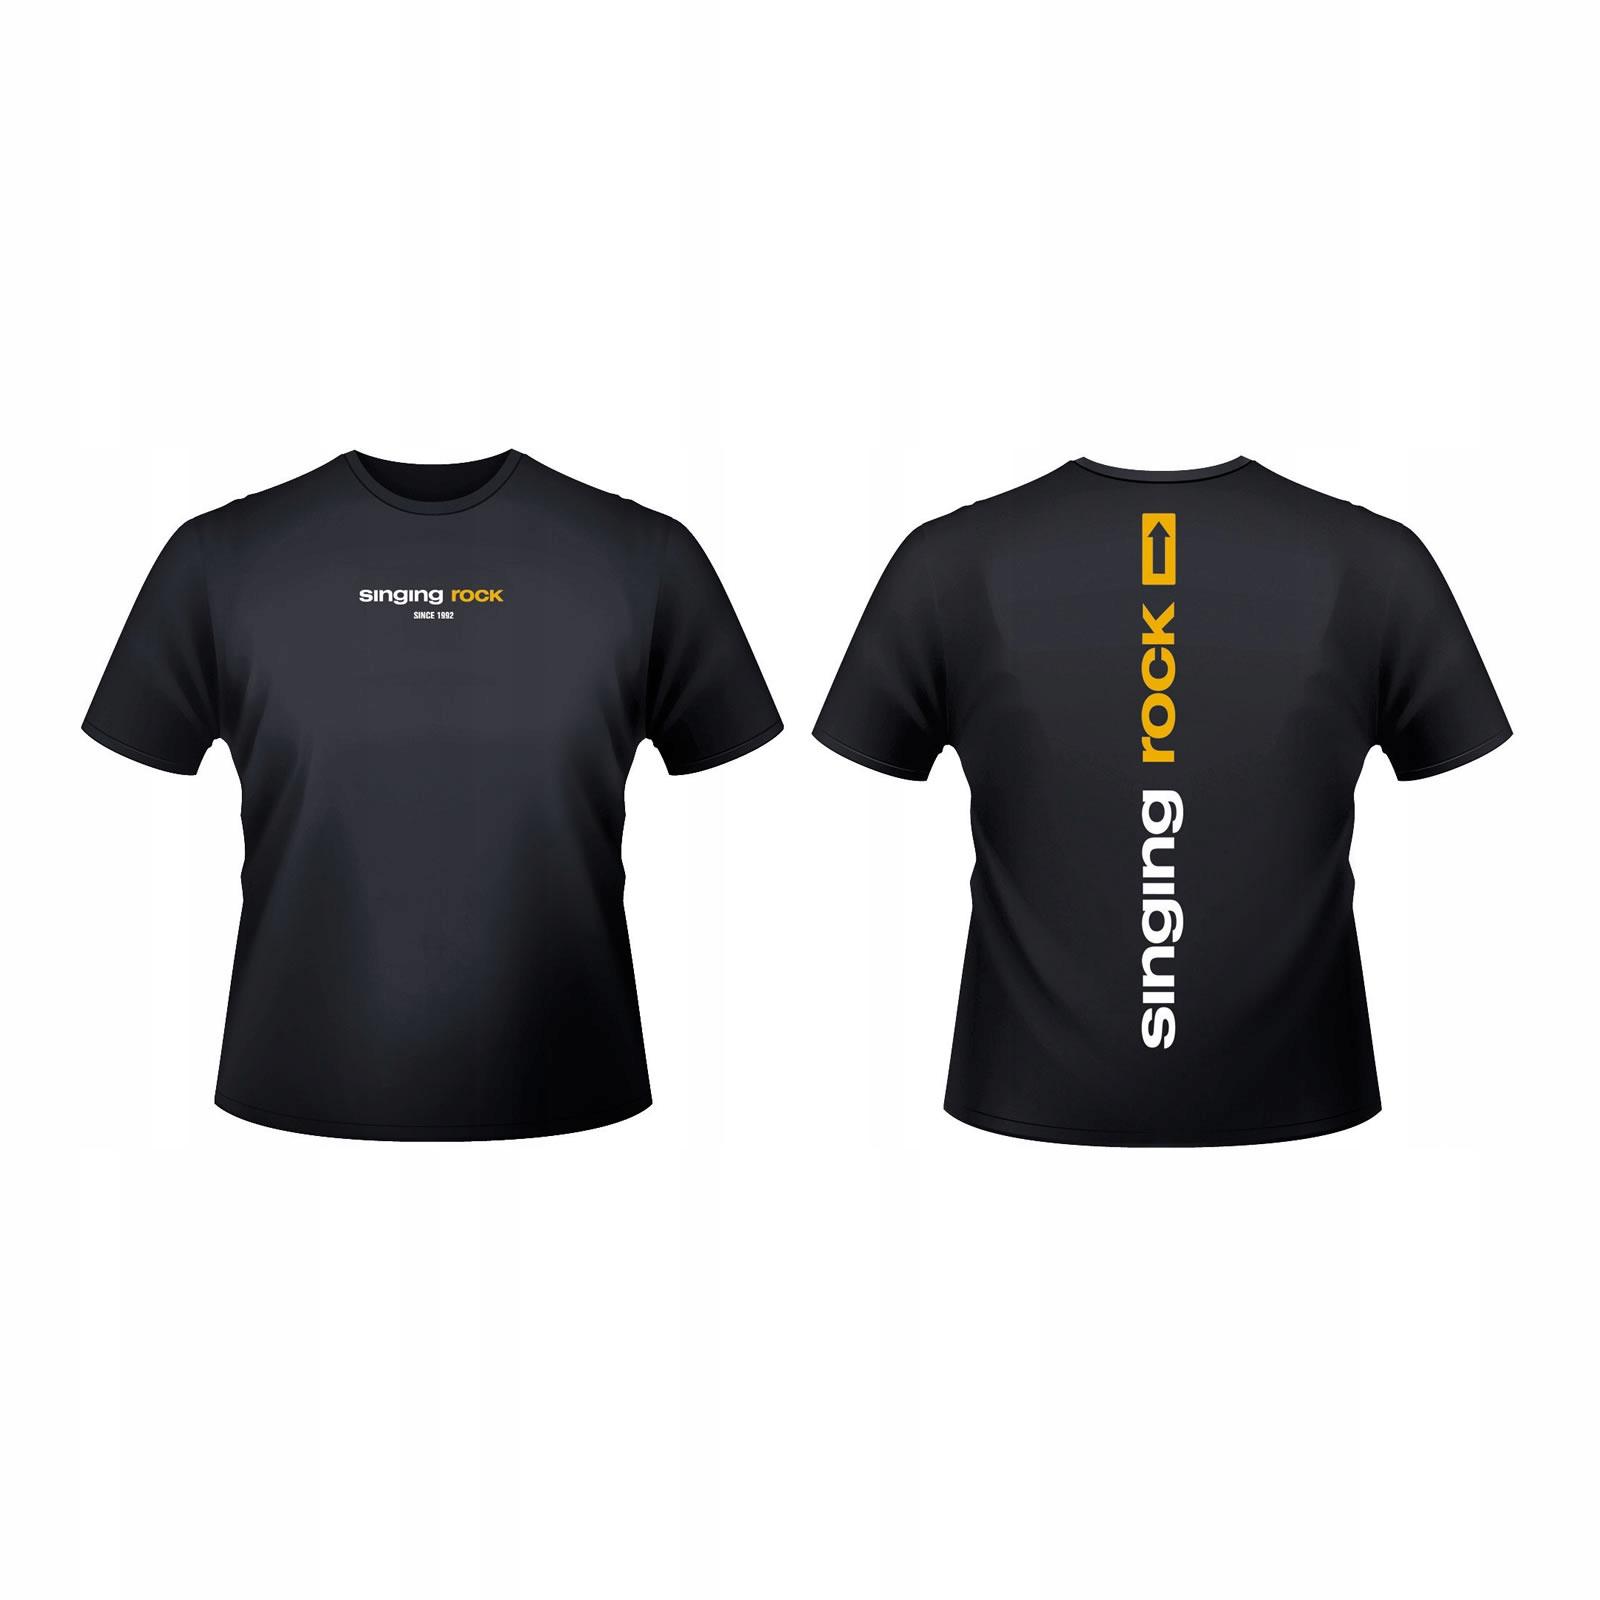 Koszulka męska Singing Rock BACKBONE ARROW XL